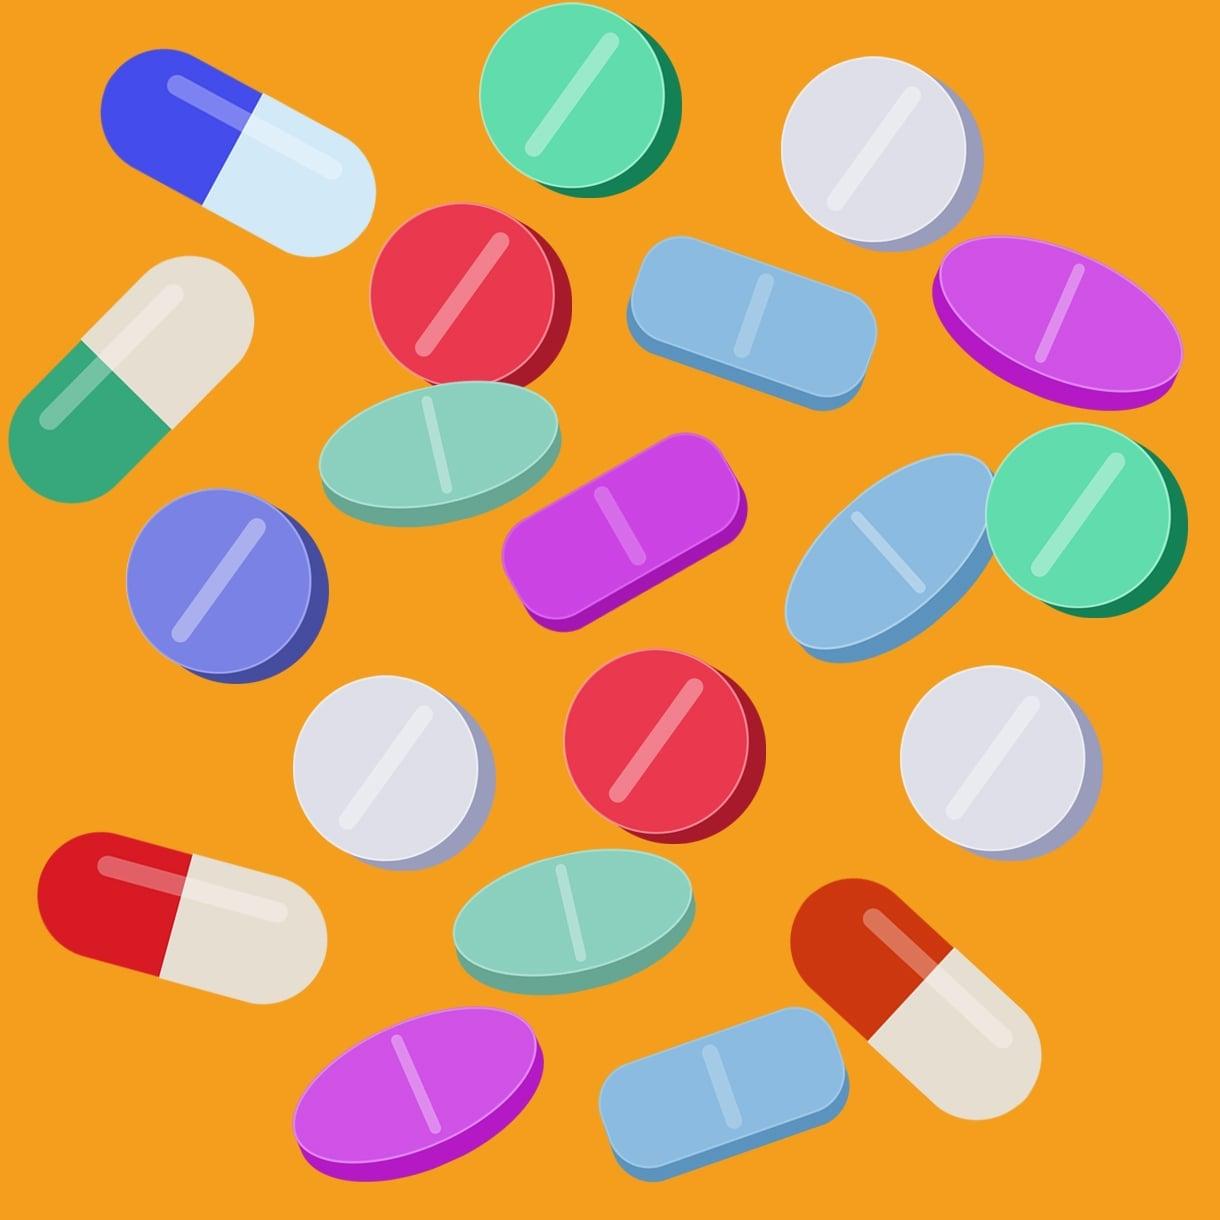 Epilepsy Medication Therapy